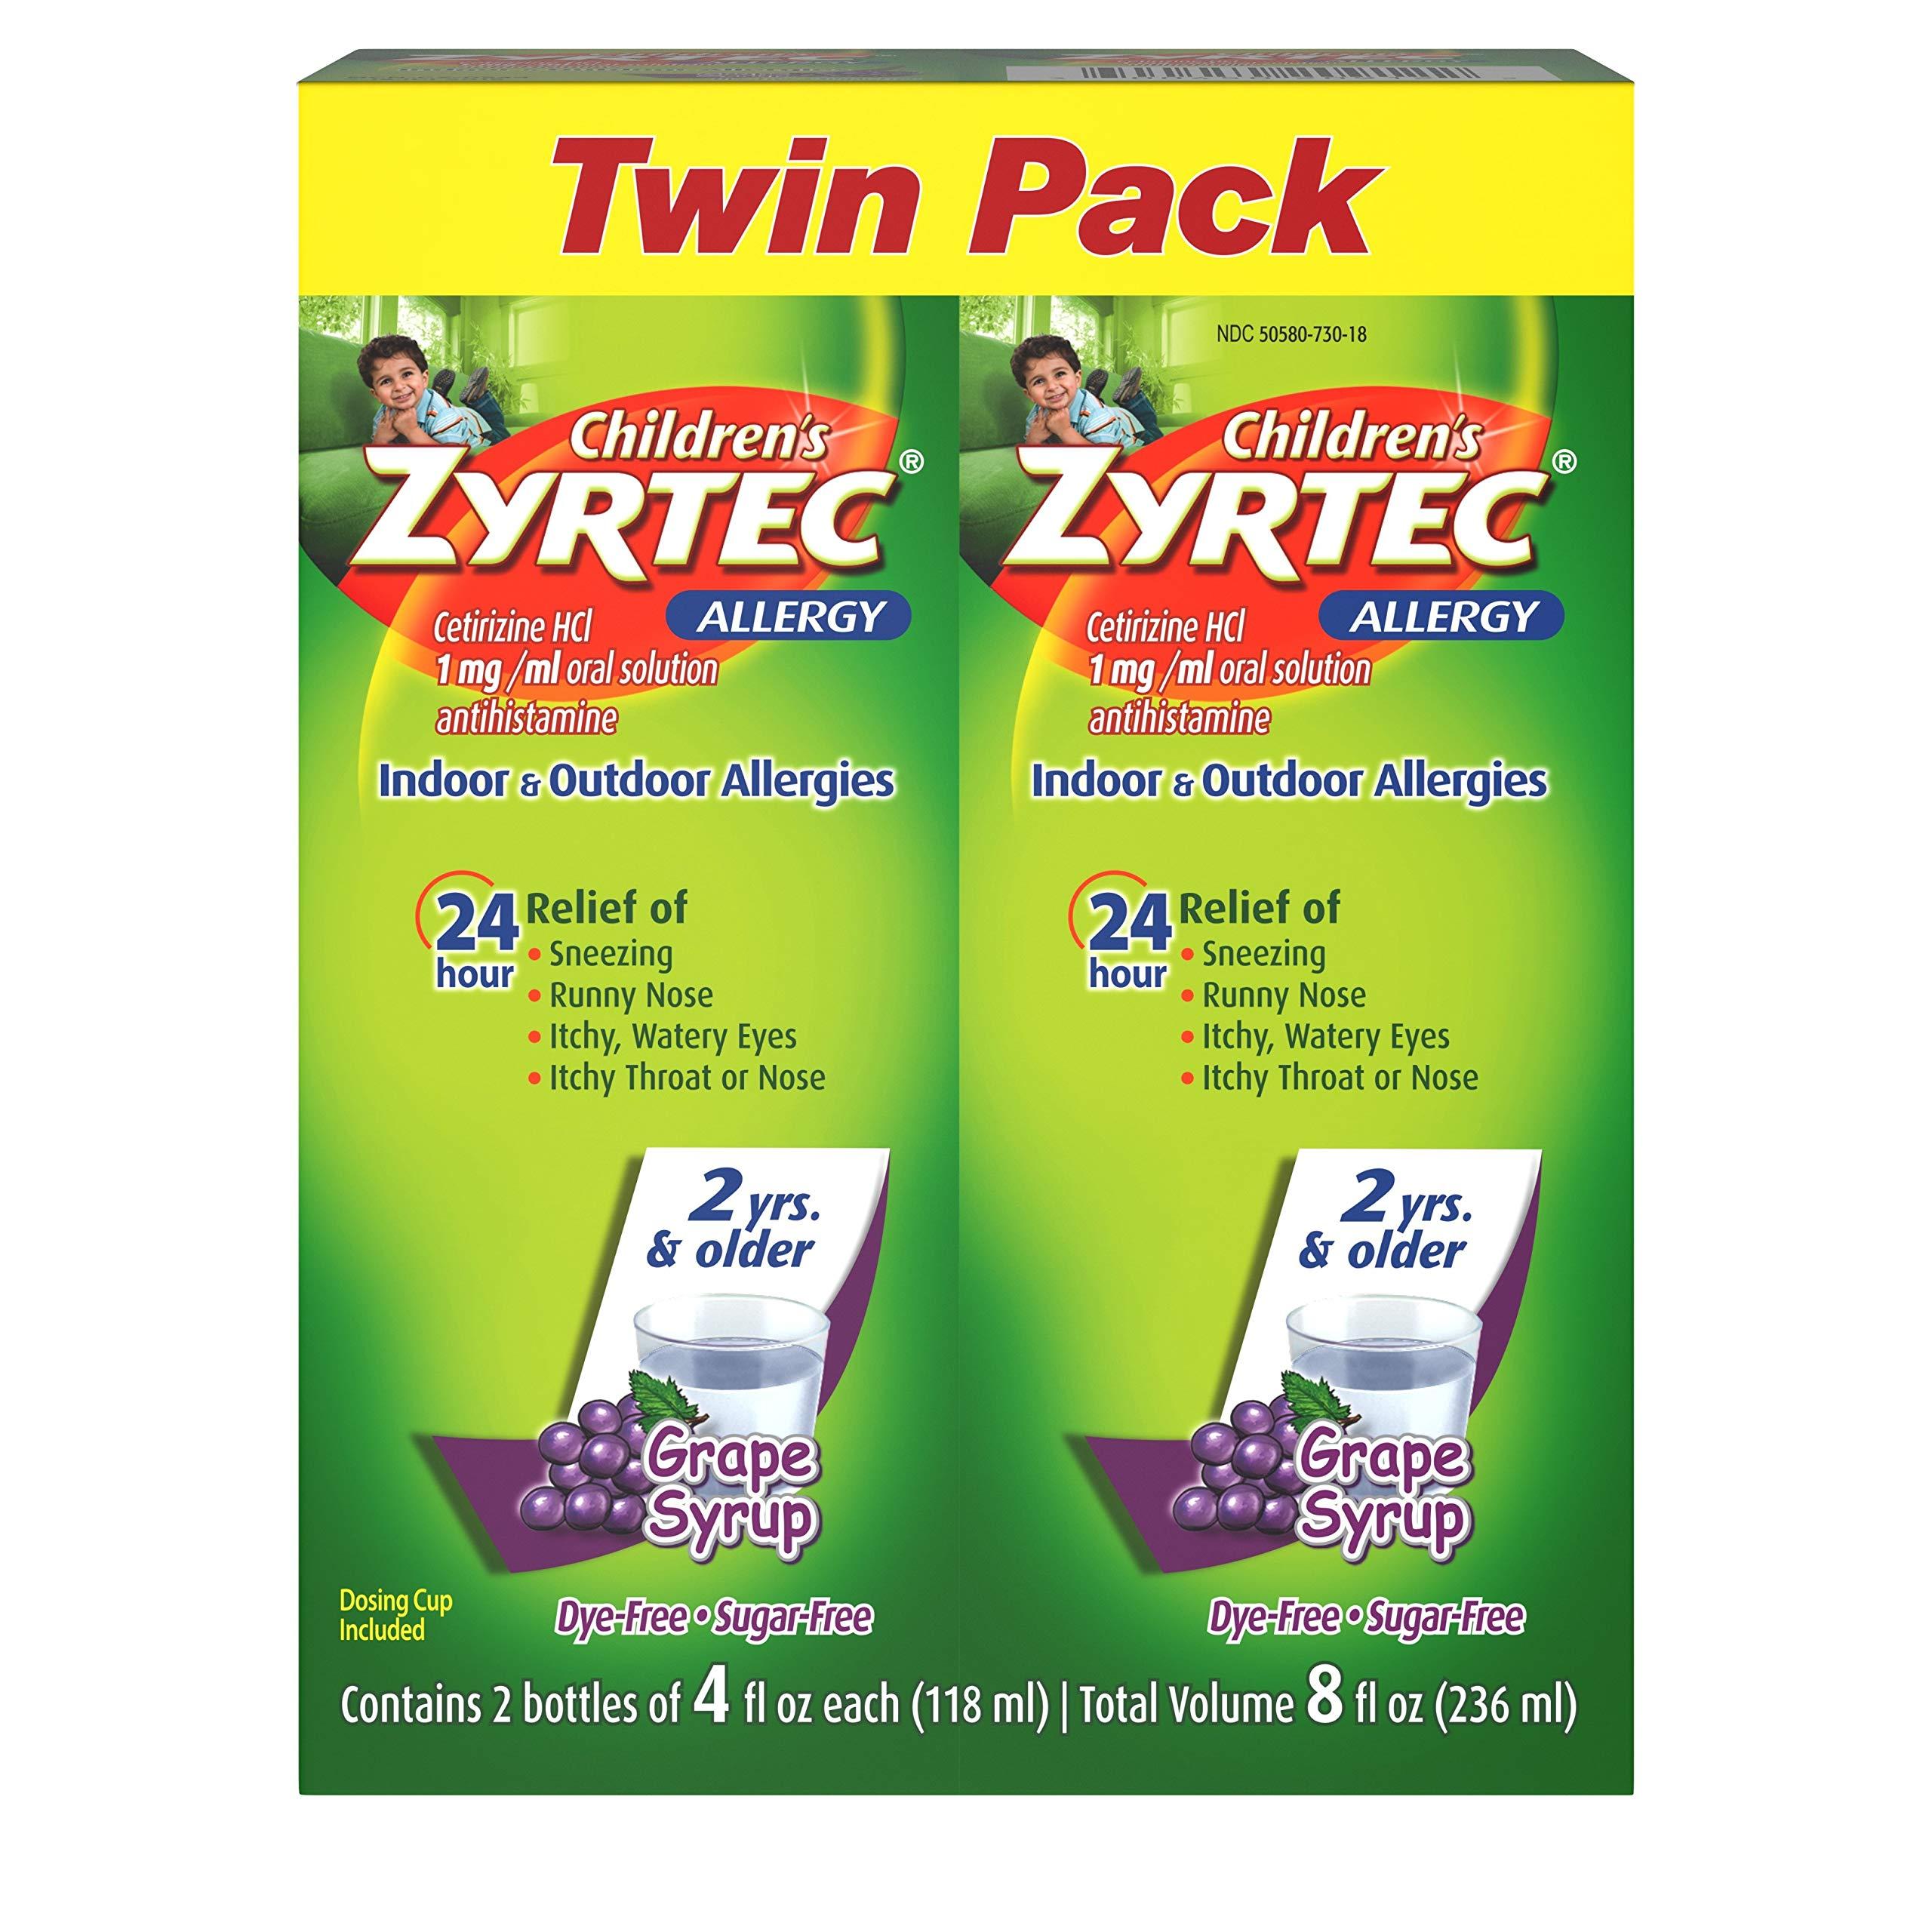 Children's Zyrtec 24 Hr Children's Allergy Syrup with Cetirizine, Sugar-Free Grape, Twin Pack of 4 Fl. Oz, 8 fl. oz. by Zyrtec